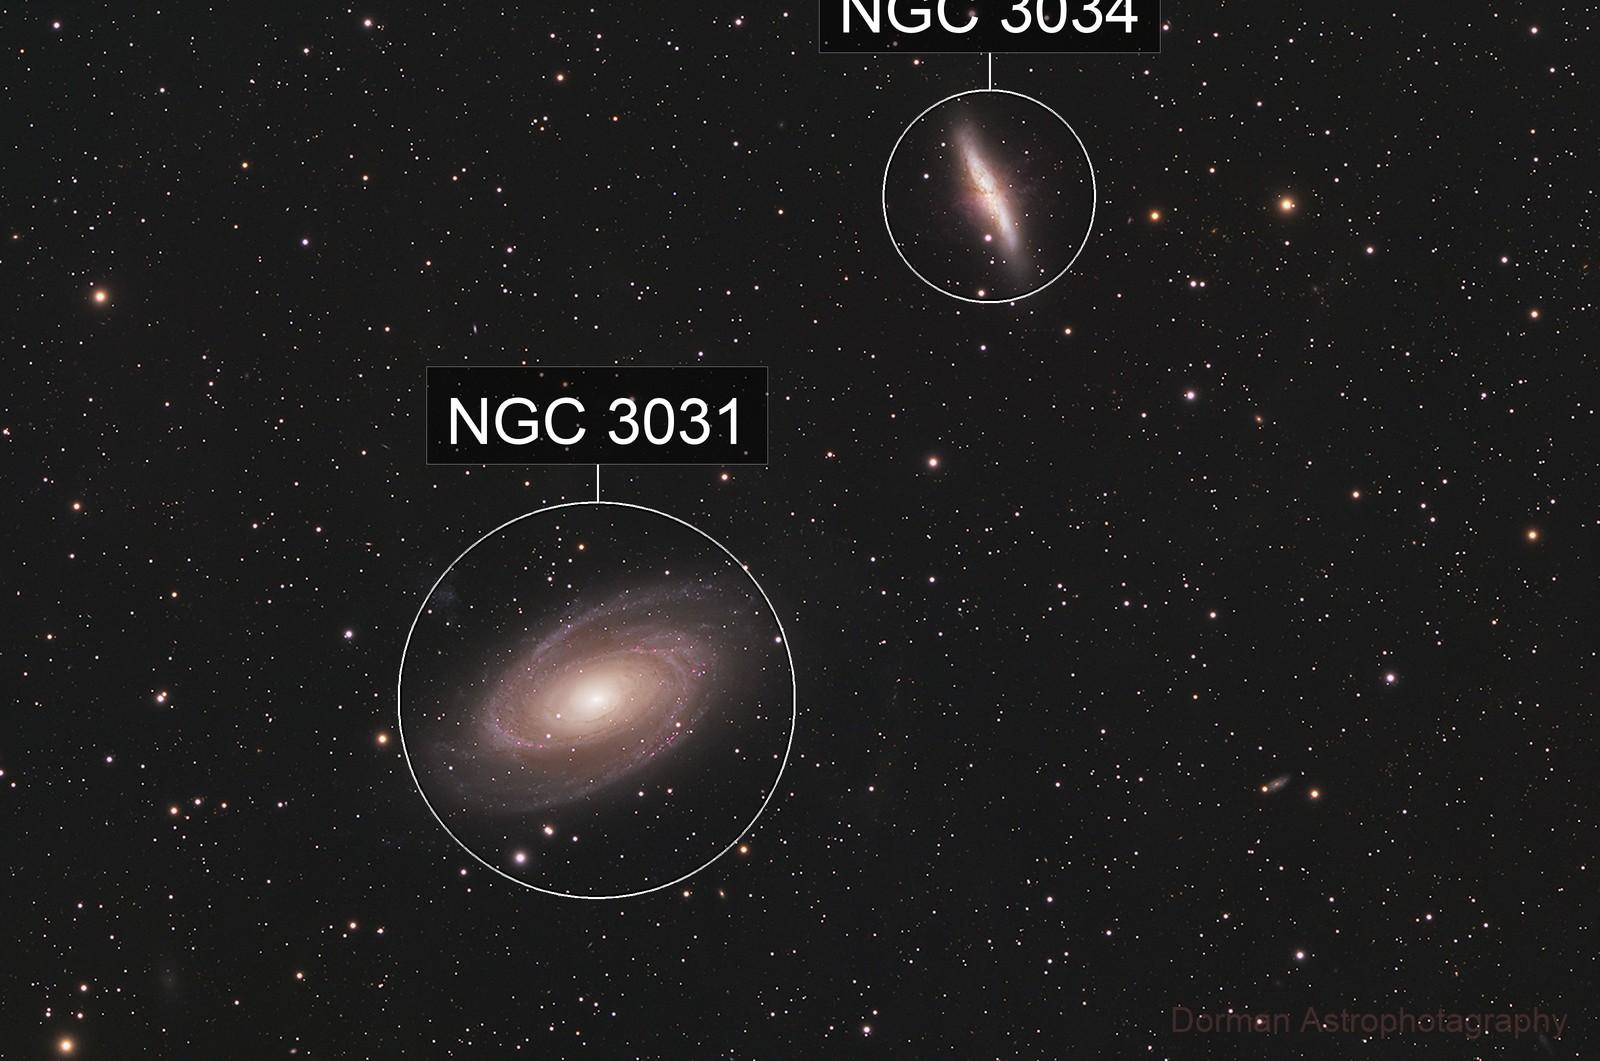 M81/M82 Bodes Nebula